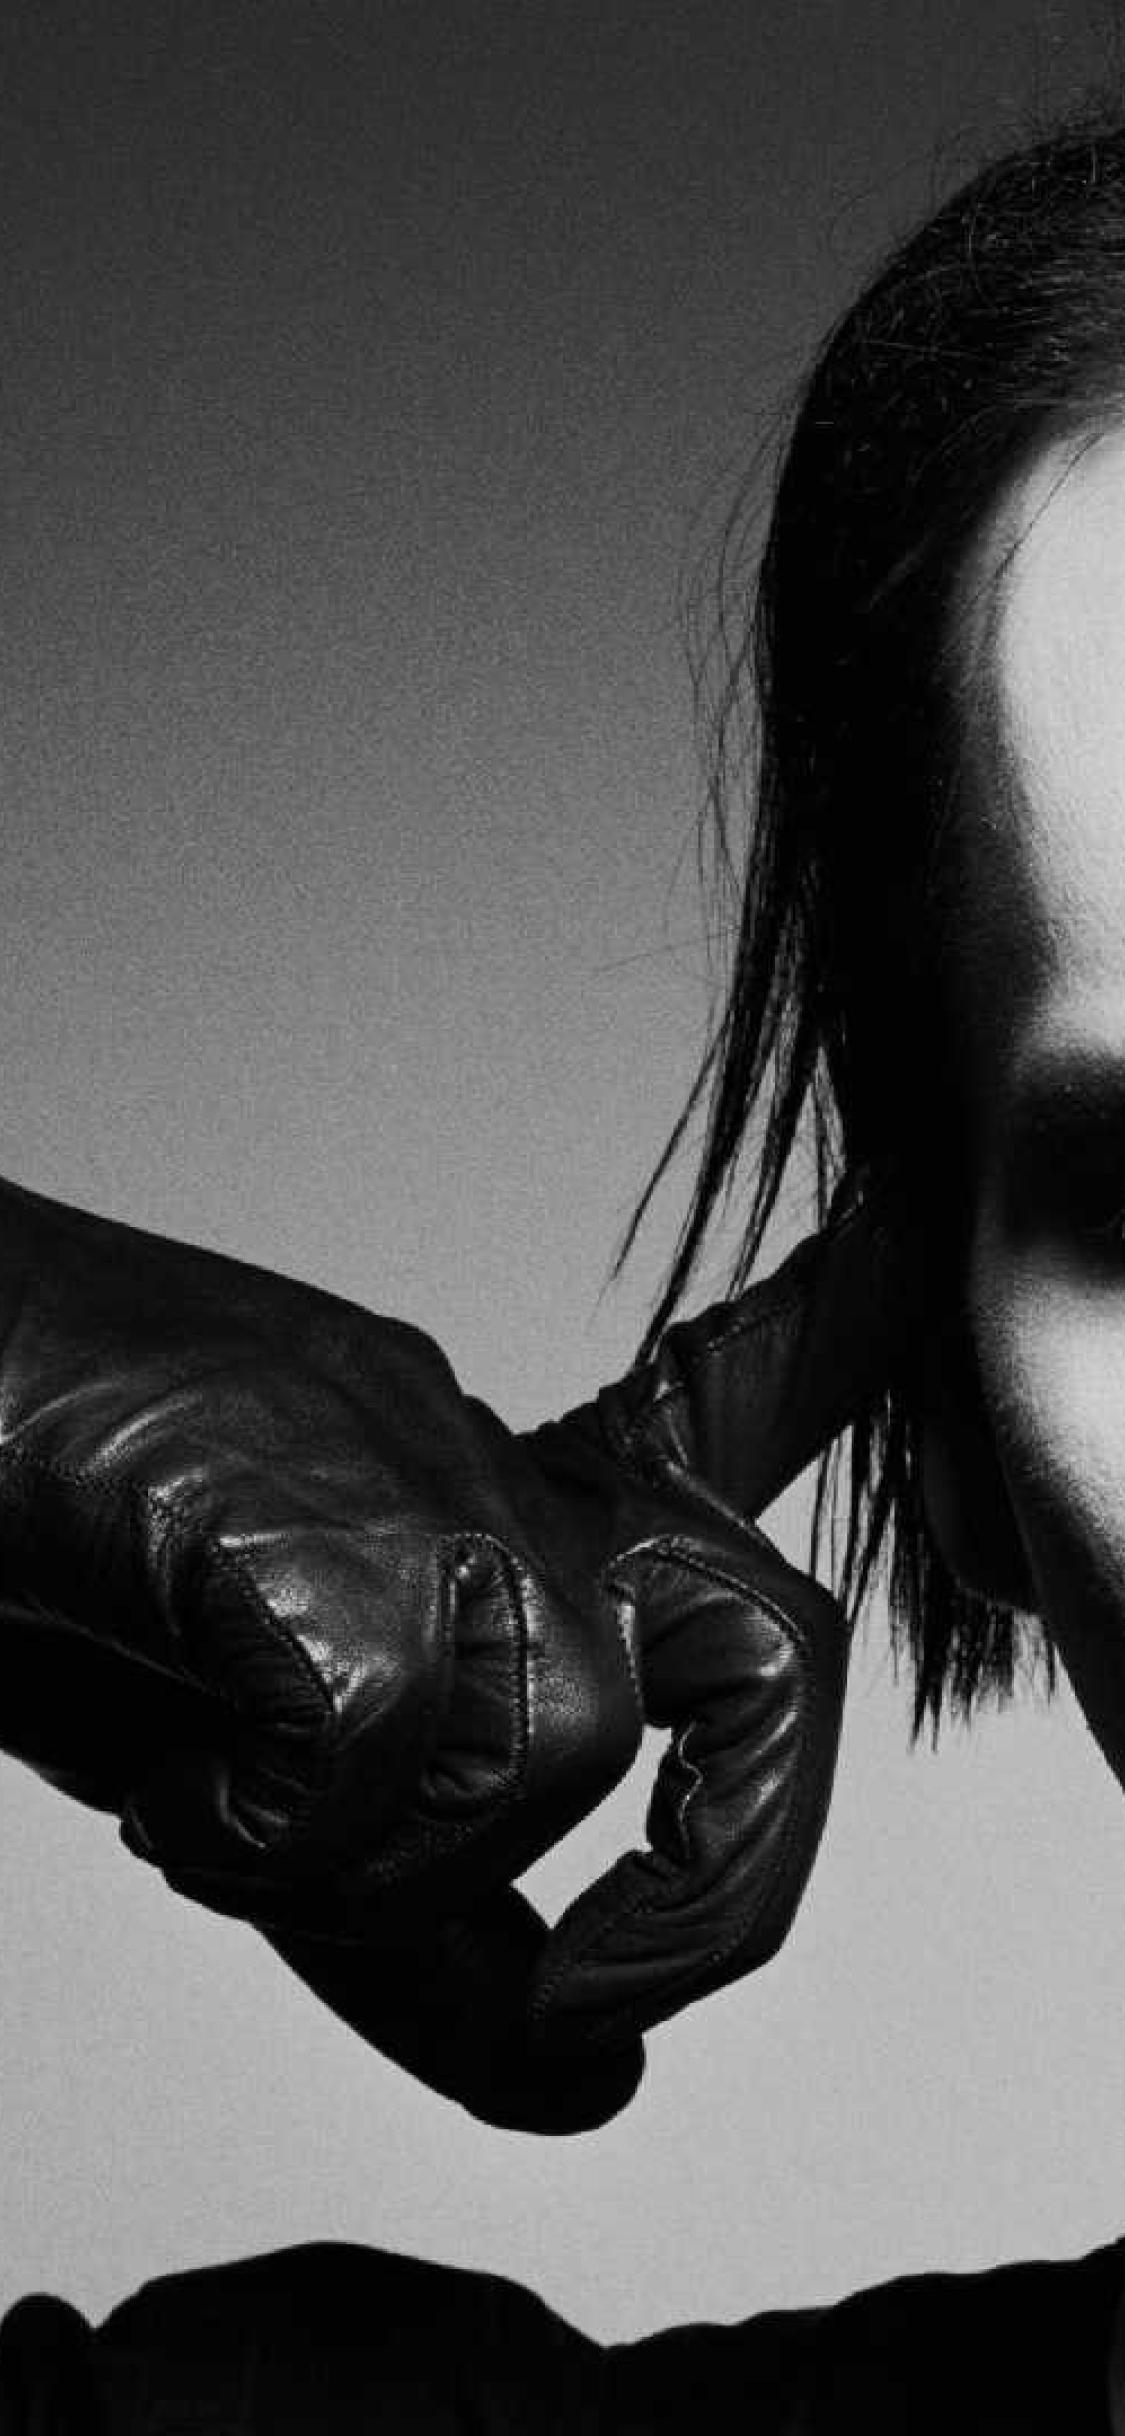 1125x2436 Marilyn Manson Face Makeup Iphone Xs Iphone 10 Iphone